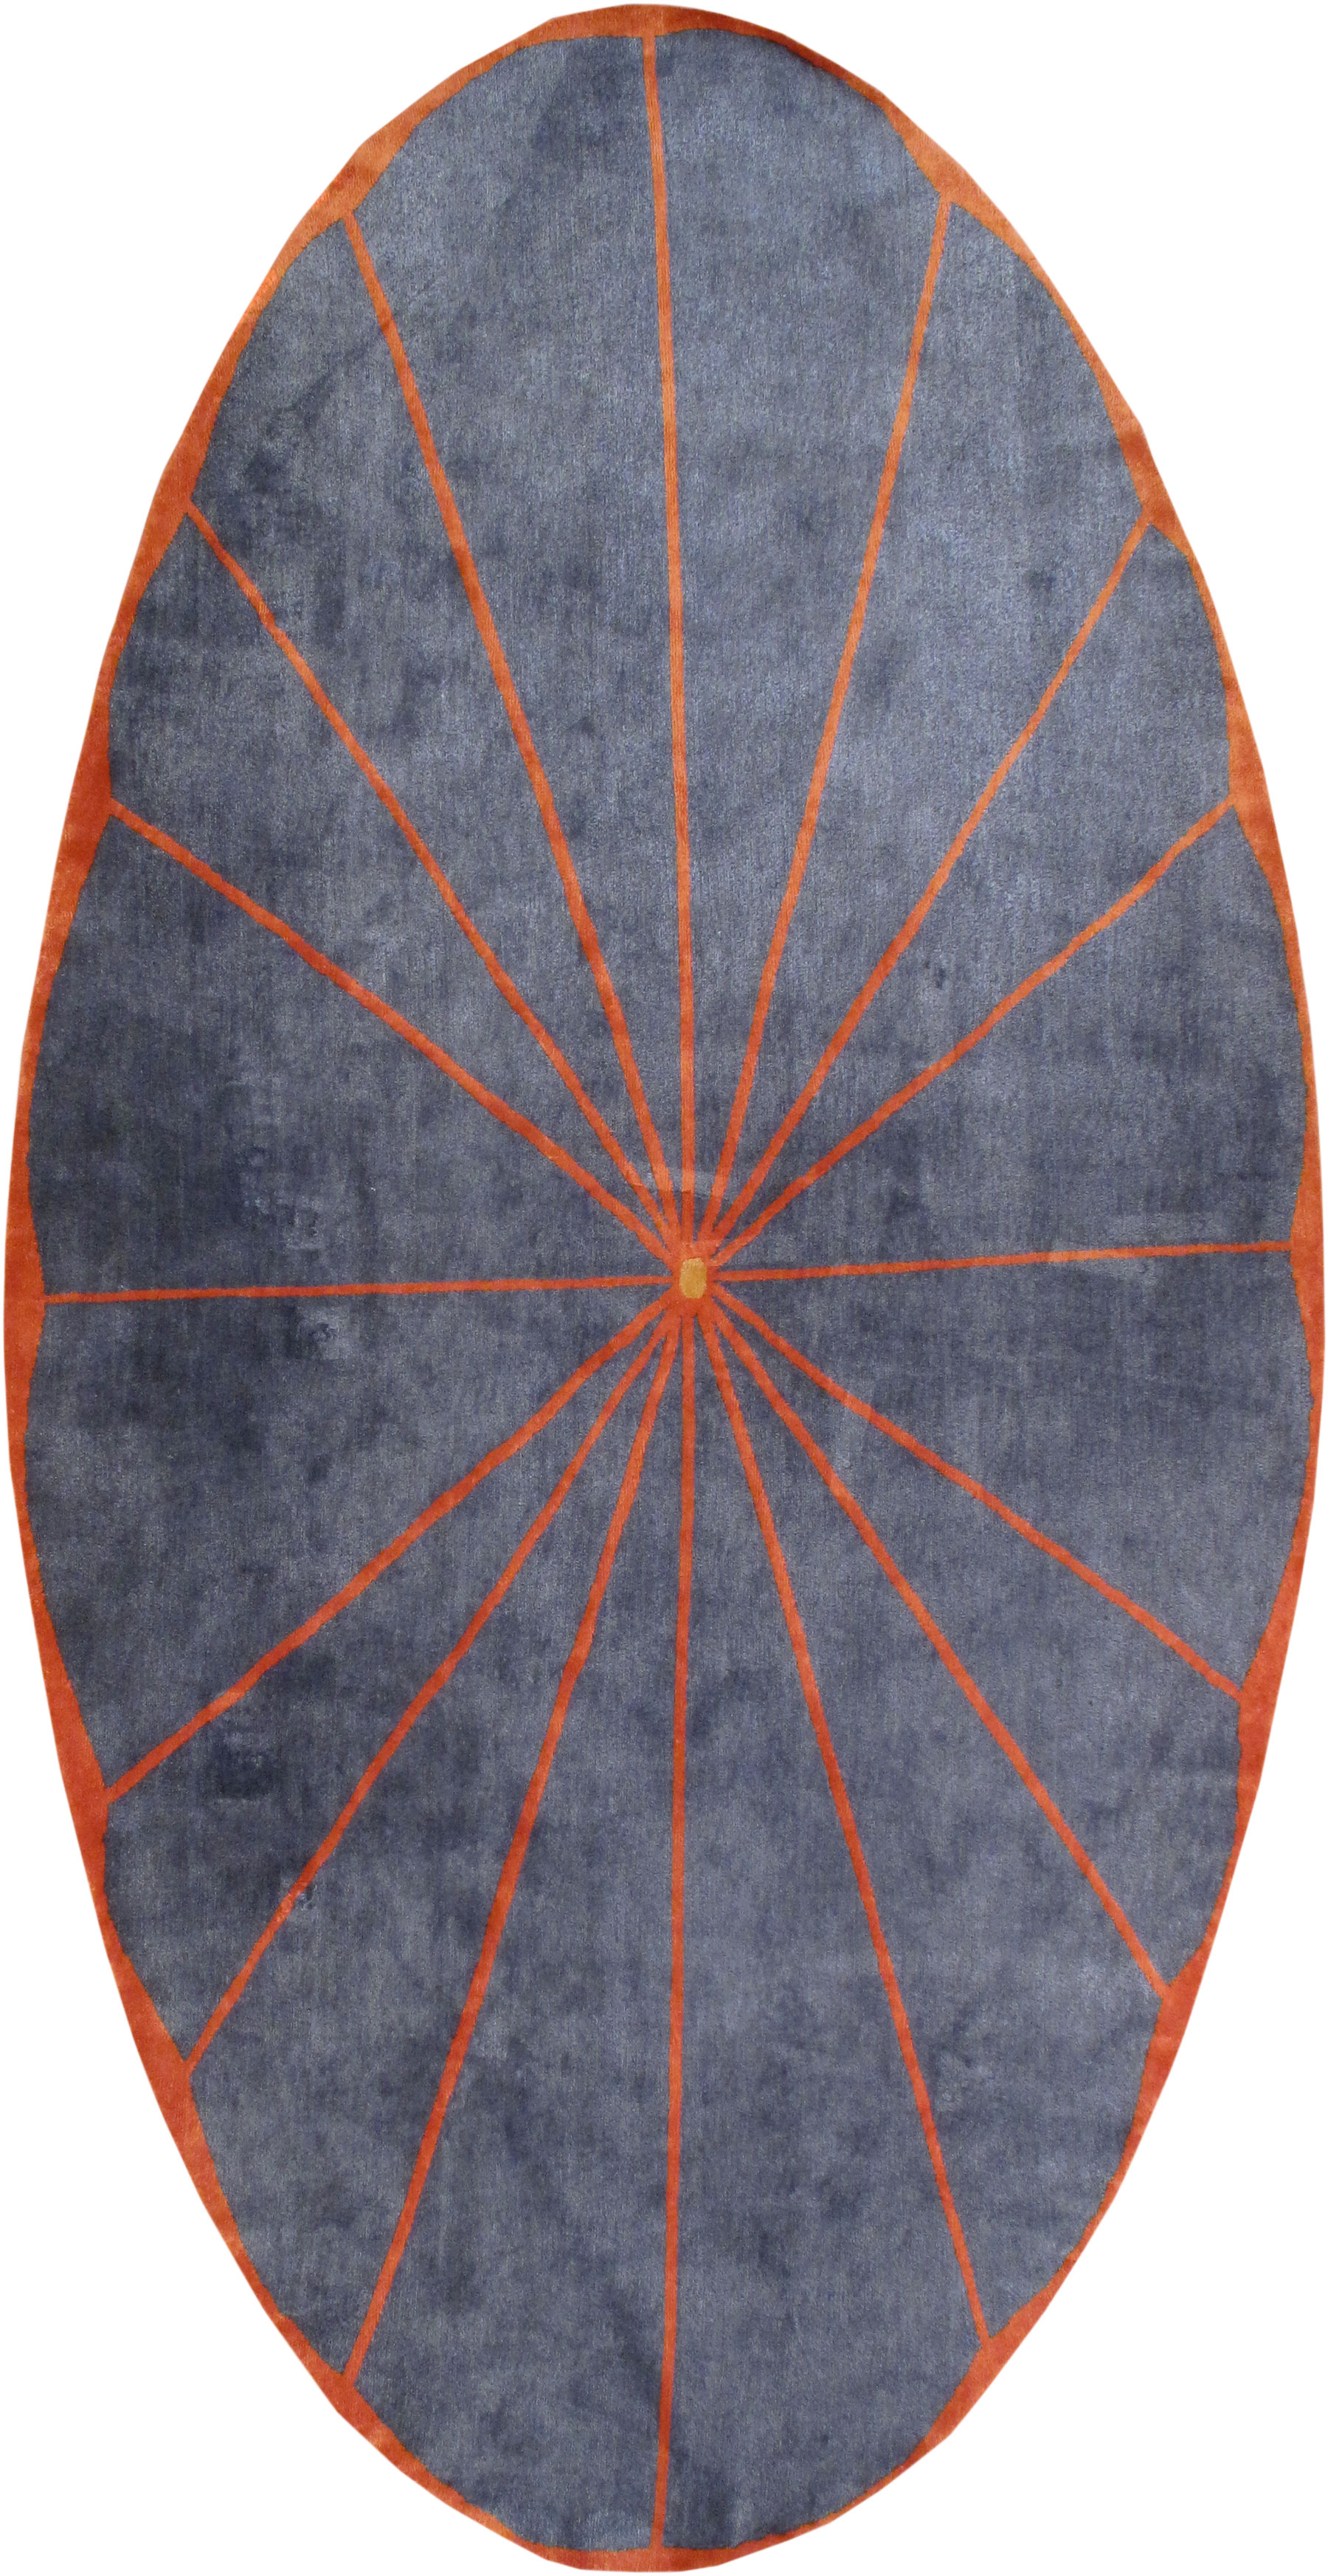 Deco Oval